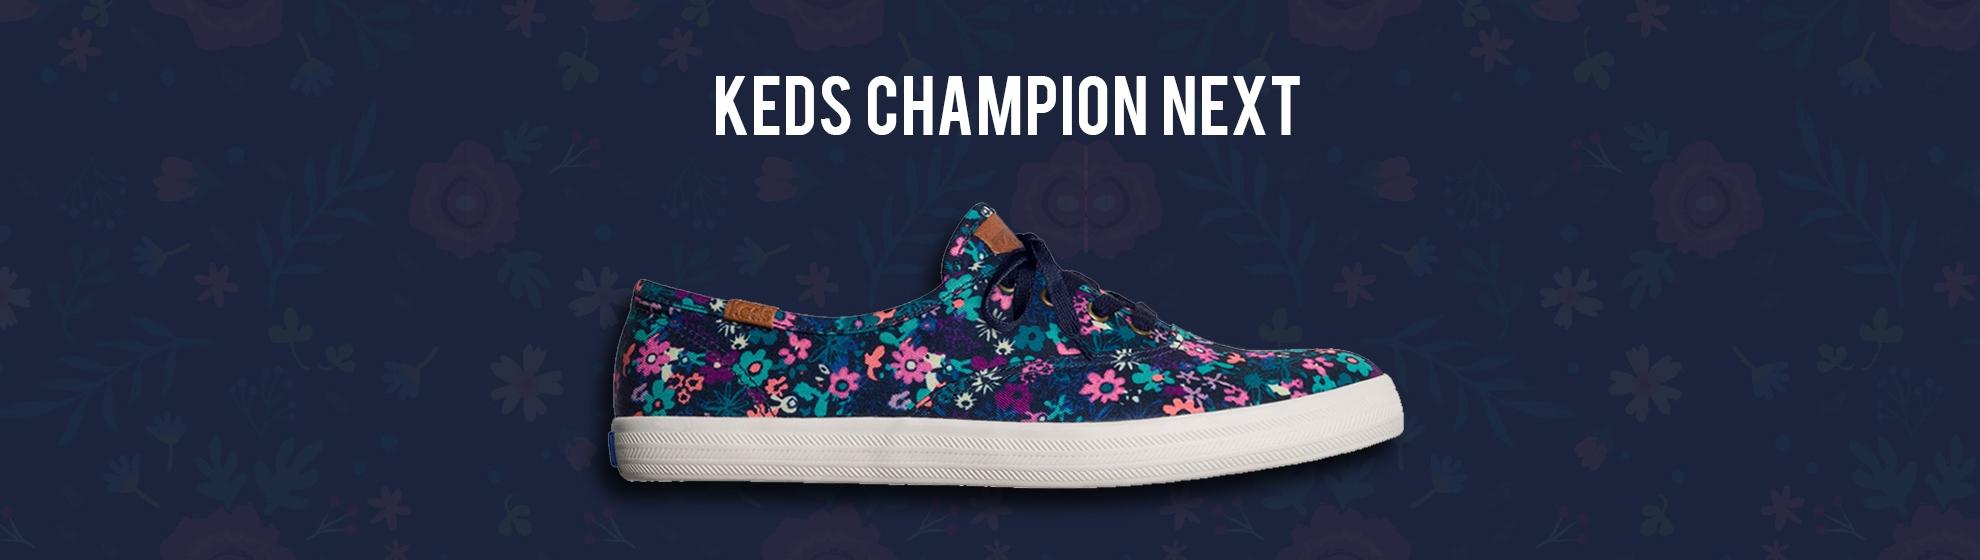 Keds Champion Next